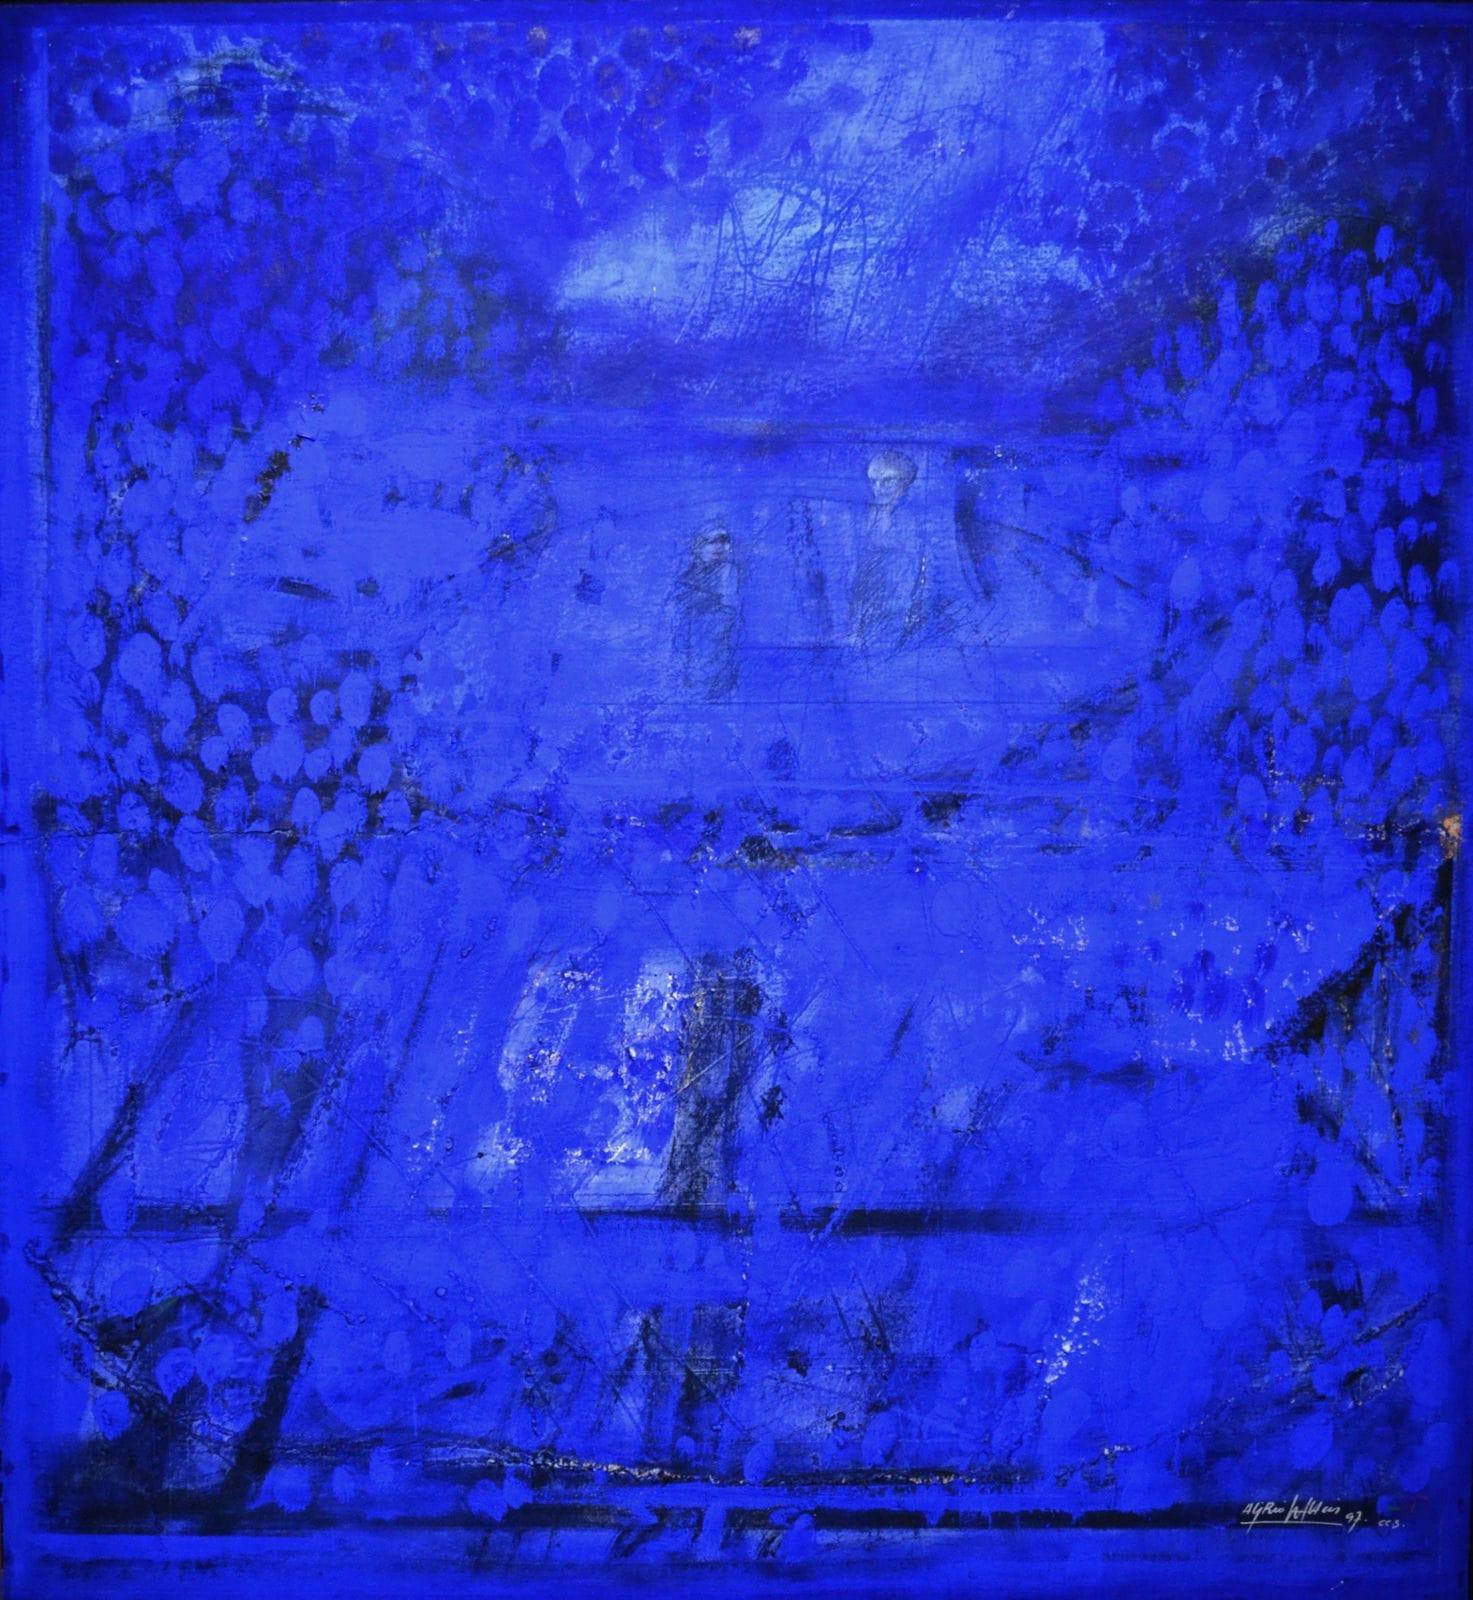 Alirio Palacios Paisaje azul, 1997 Oil on canvas 150 x 160 cm | 59 x 62.9 in.